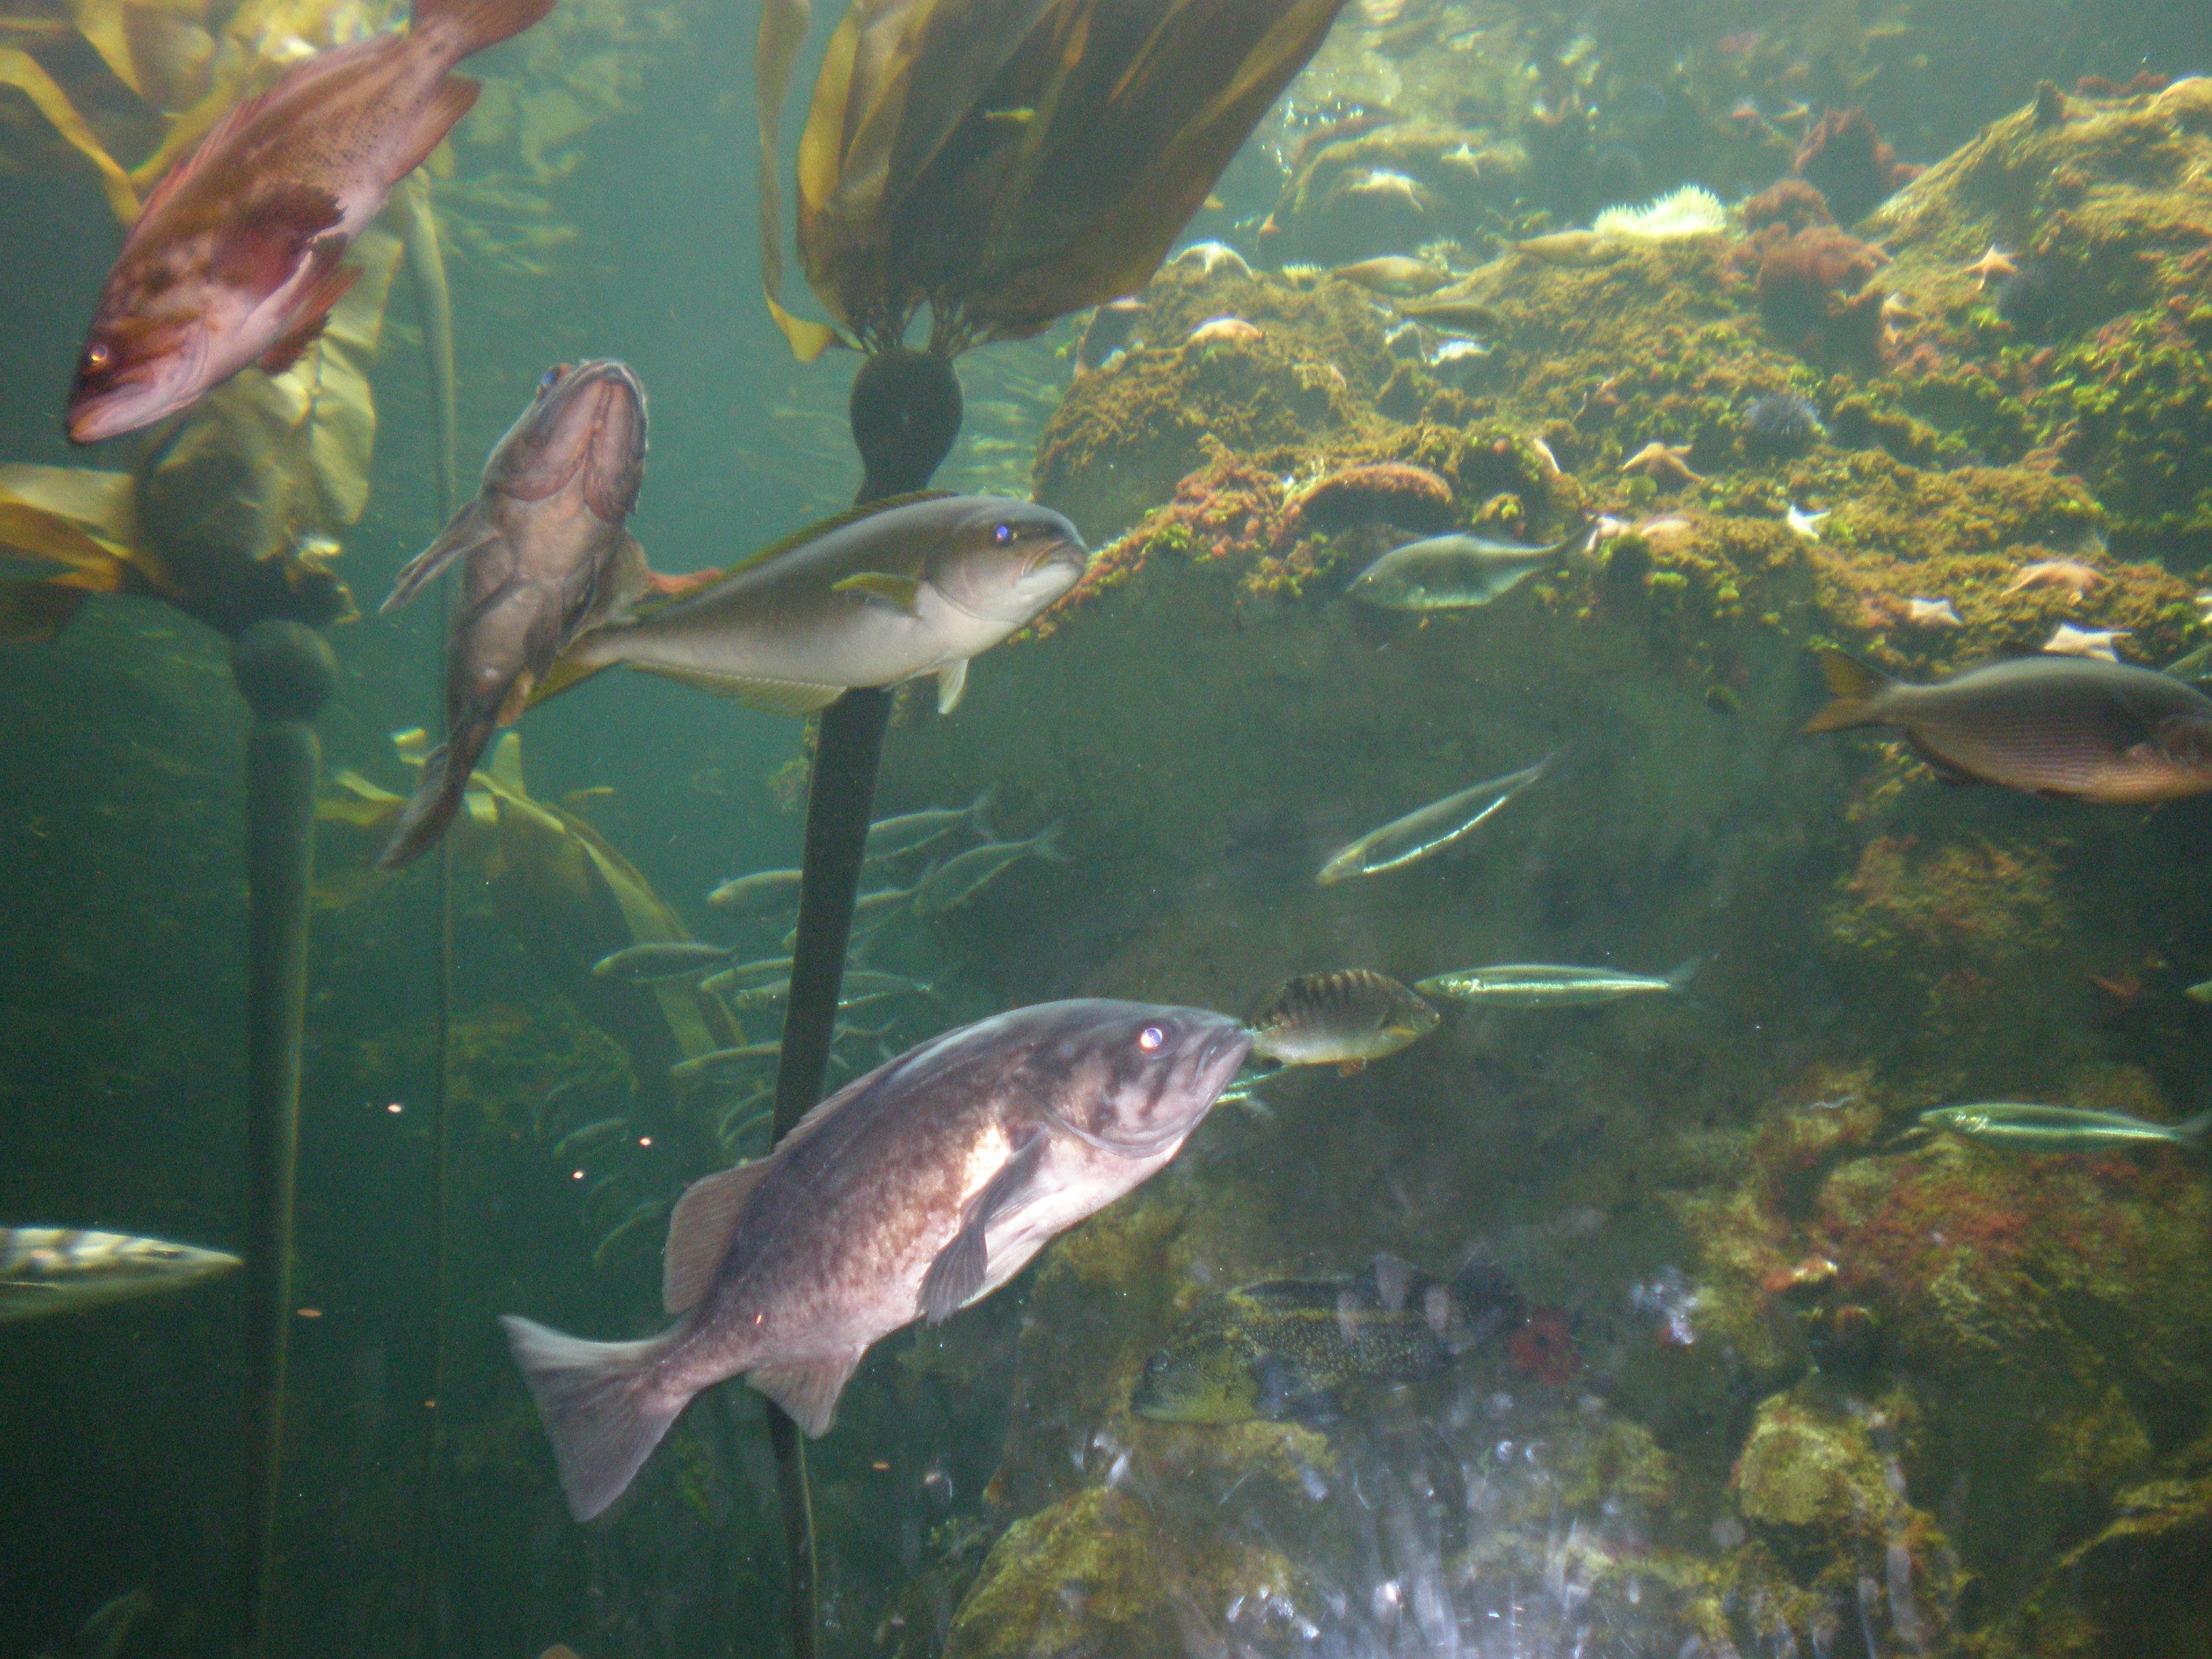 File:Northern California Coast aquarium CAS 1.JPG - Wikimedia Commons